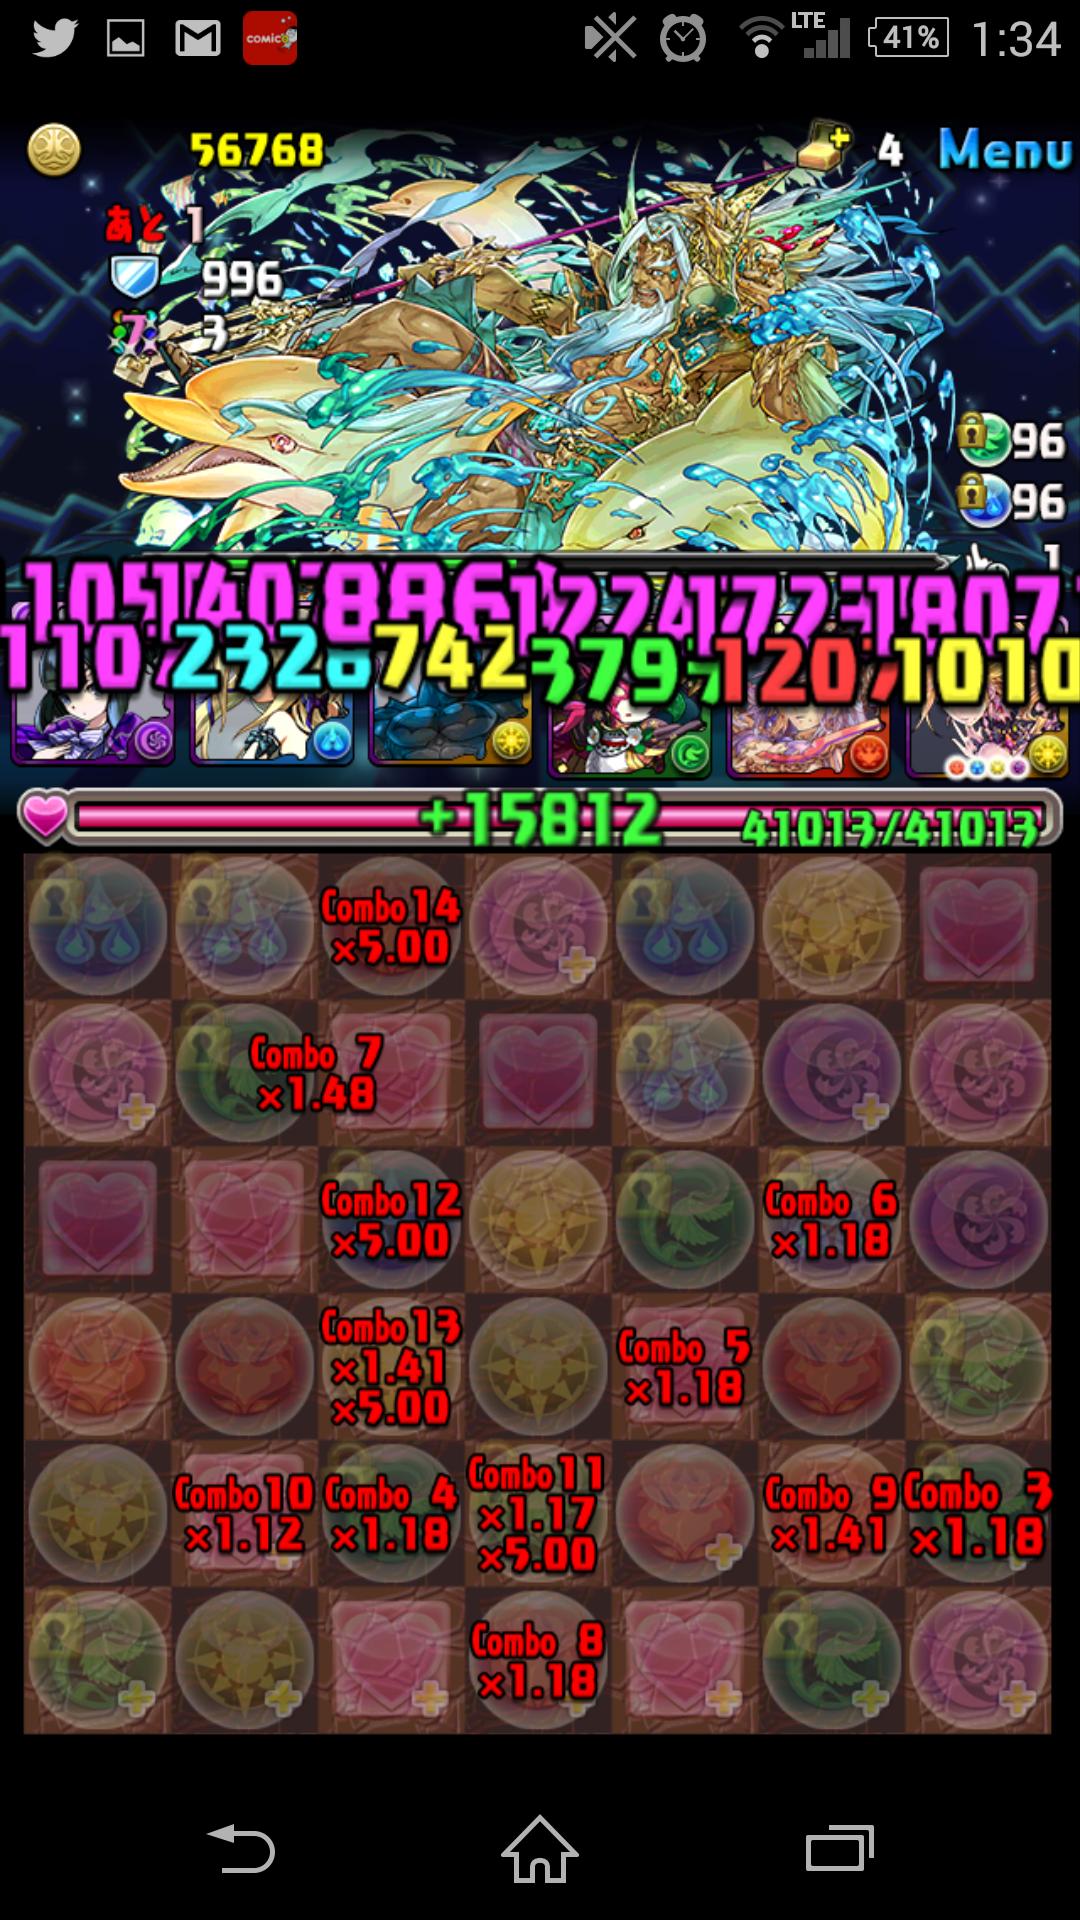 Screenshot_2015-11-23-01-34-16.png